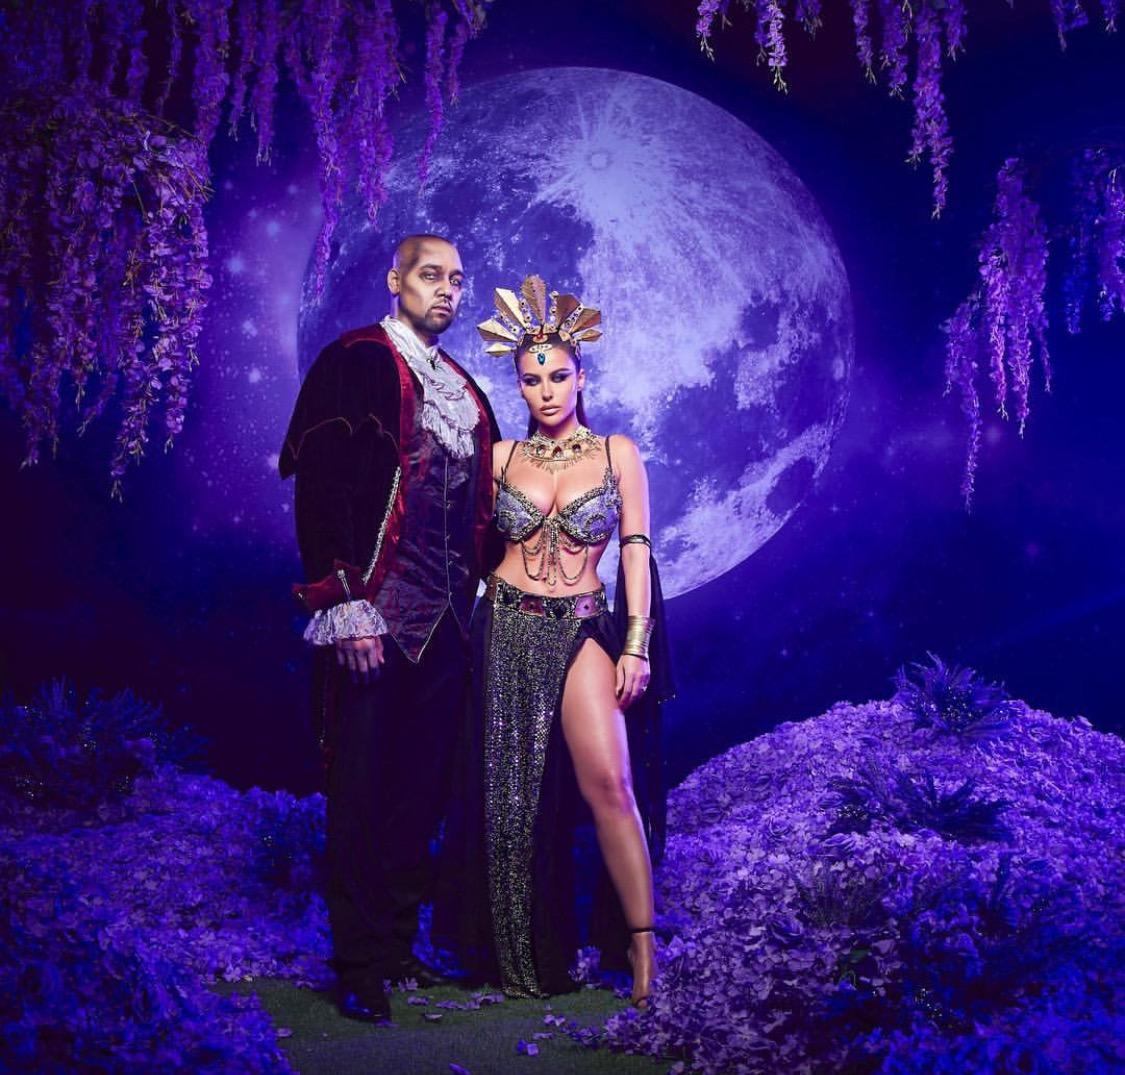 Amrezy's Queen of the damned Halloween look is beyond surreal